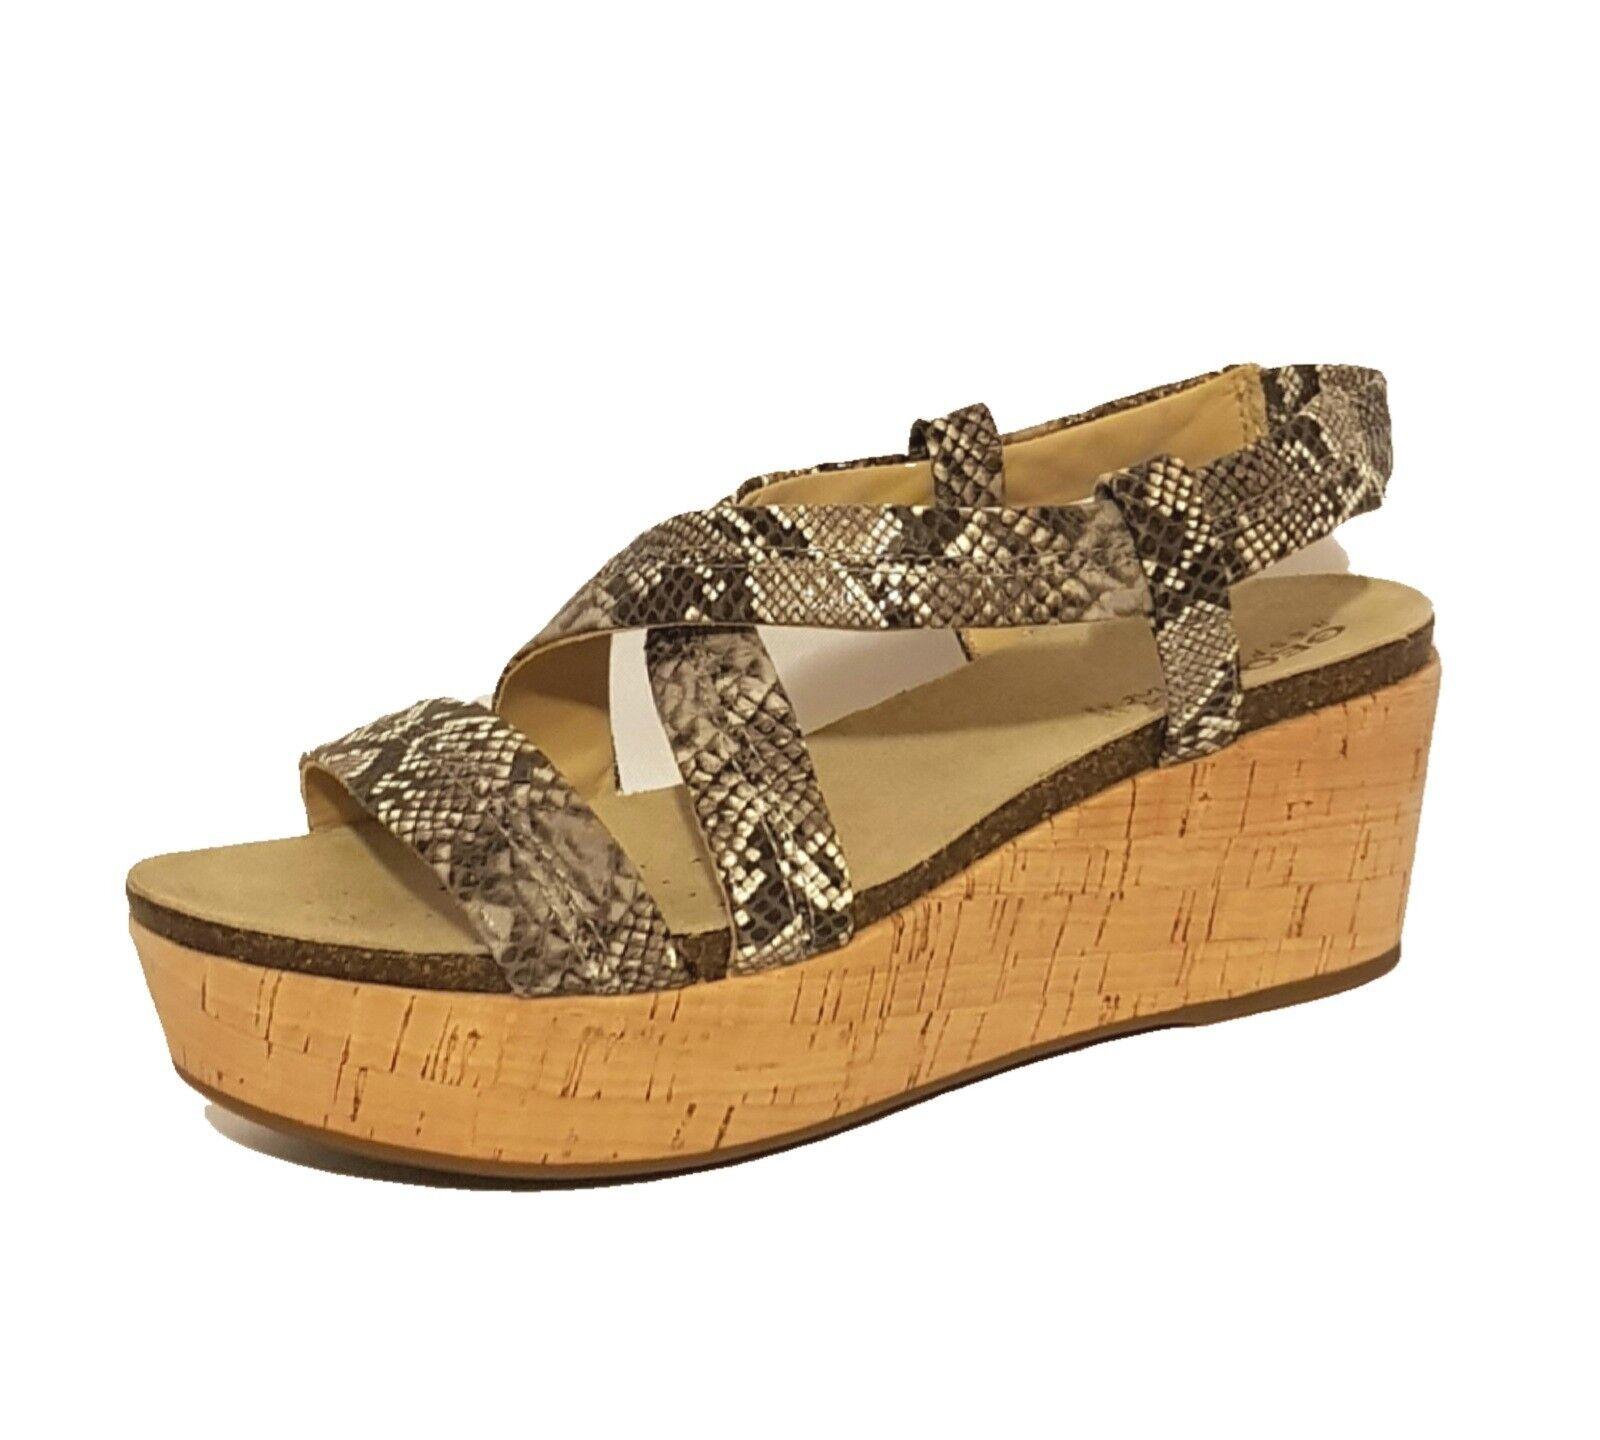 GEOX RESPIRA D GENUINE JALIA   SNAKE GENUINE D LEATHER WEDGES SANDALS Schuhe LADIES 25c464